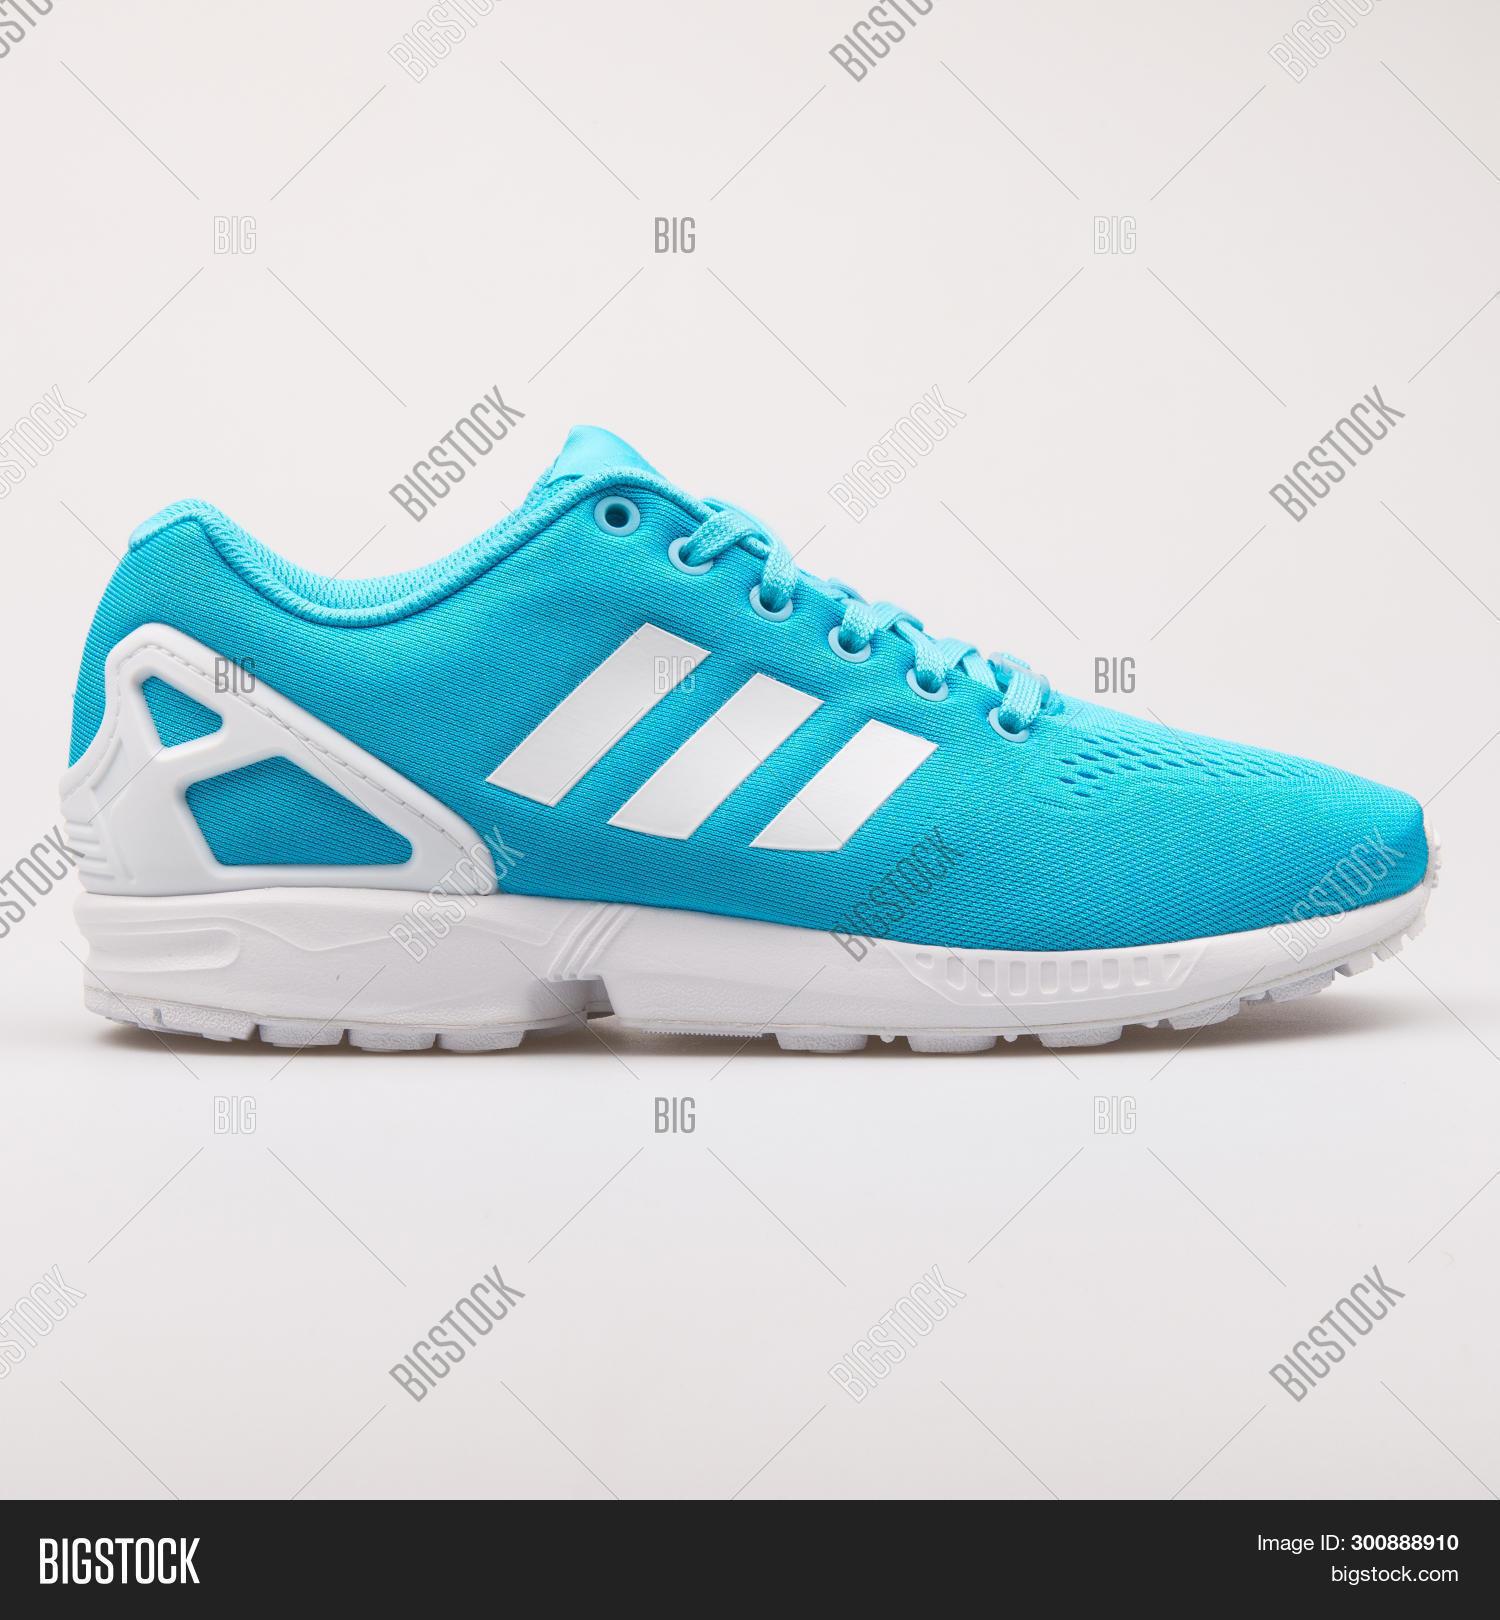 adidas id zx flux